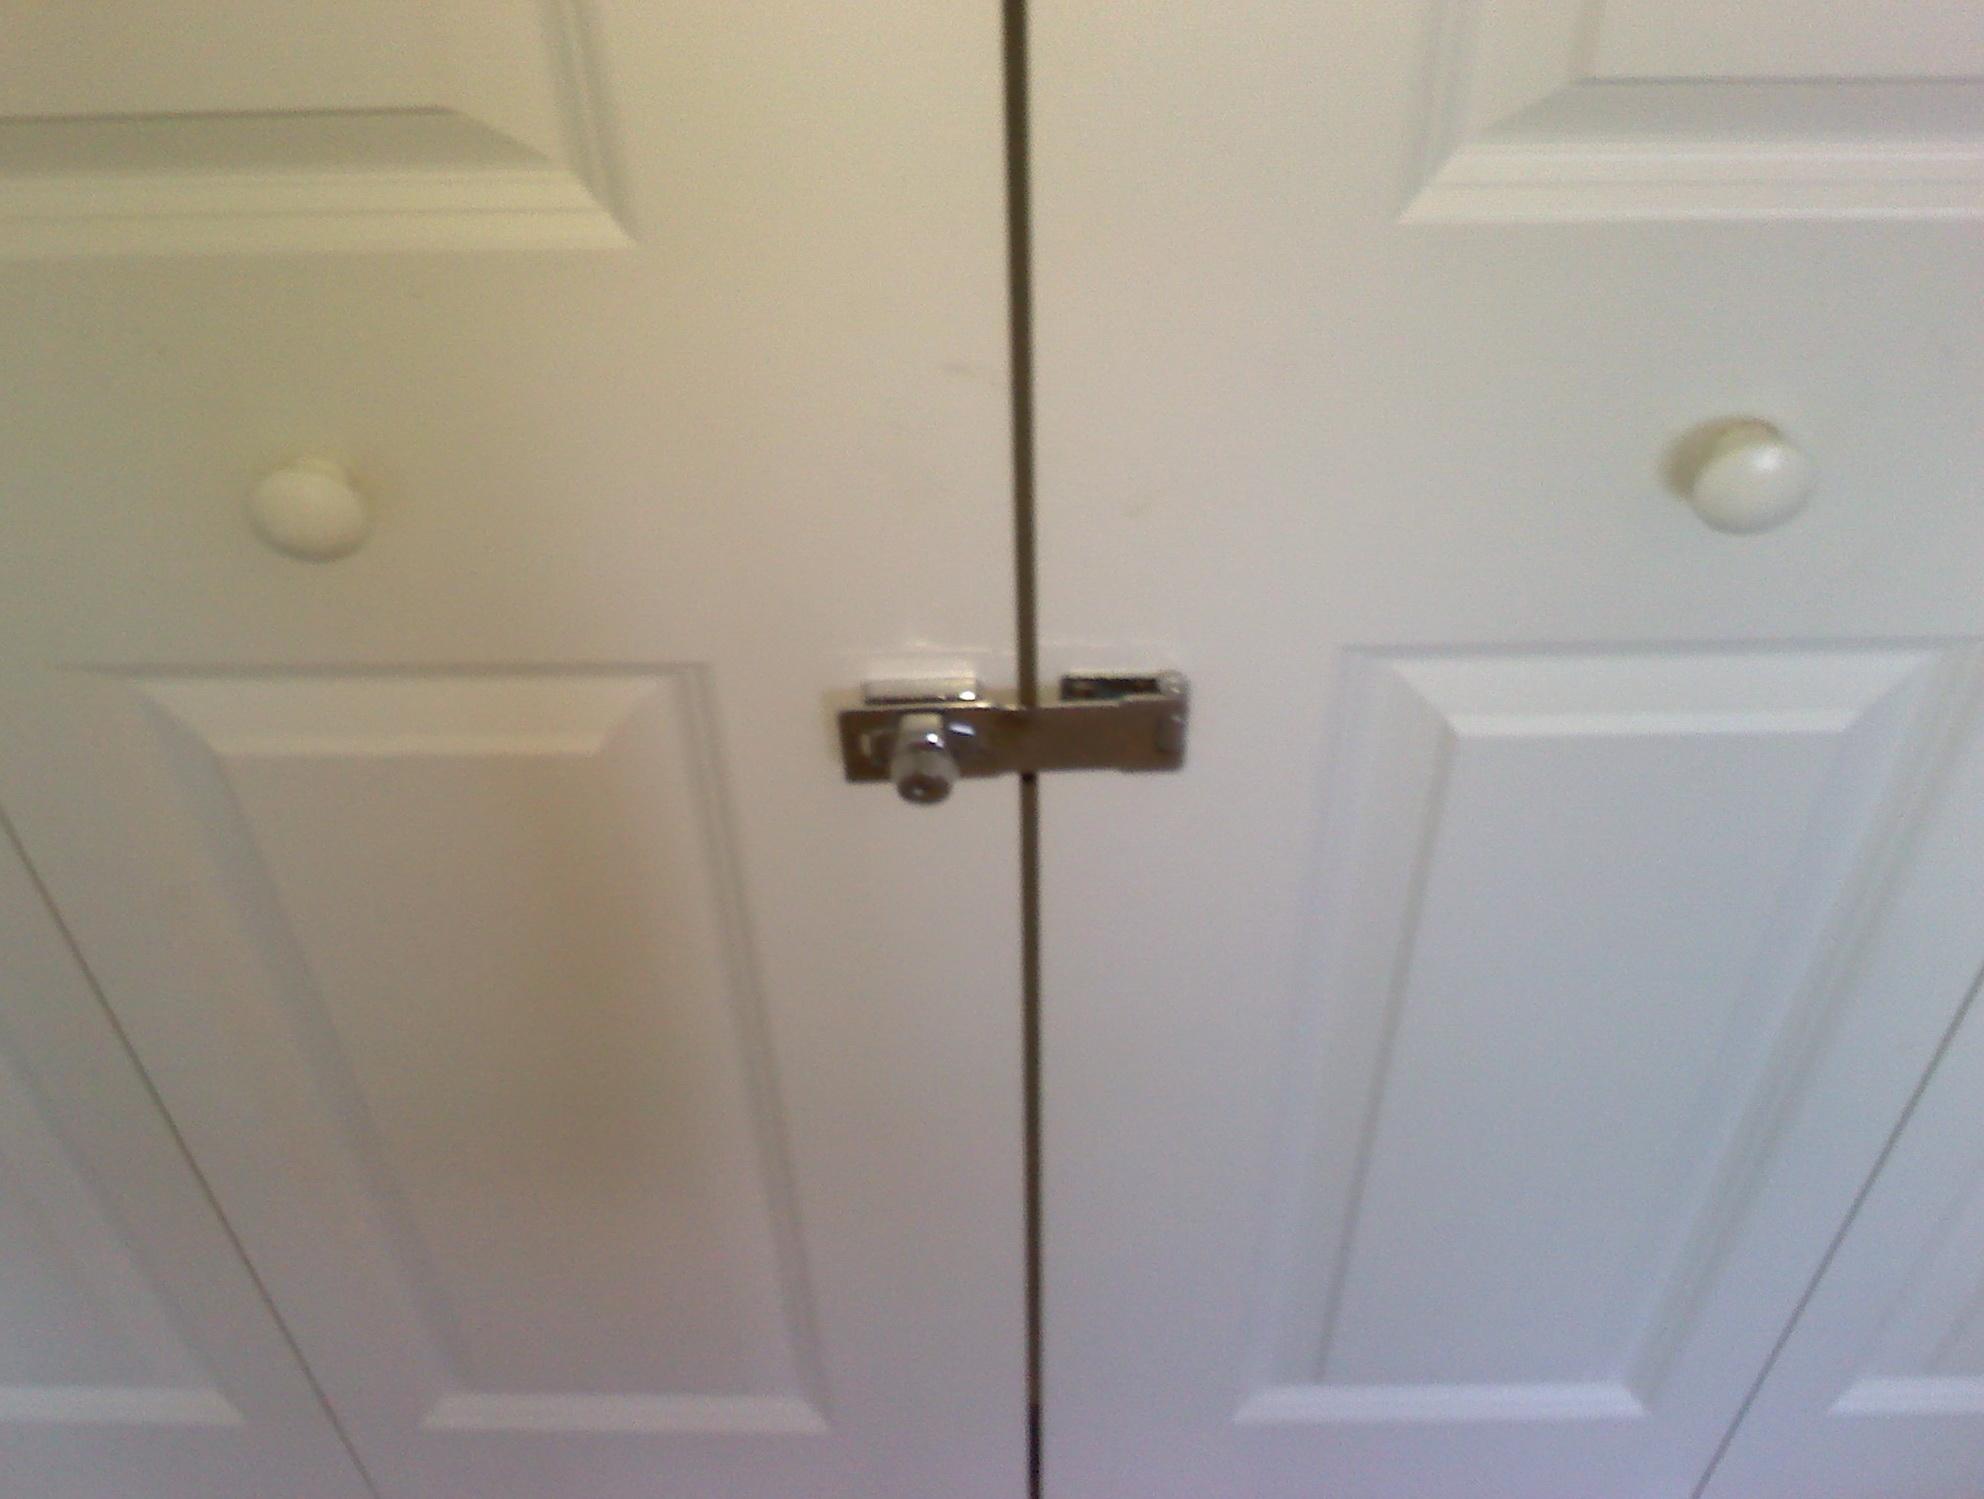 Sliding Closet Door Locks With Keyconstruct double closet door locks roselawnlutheran